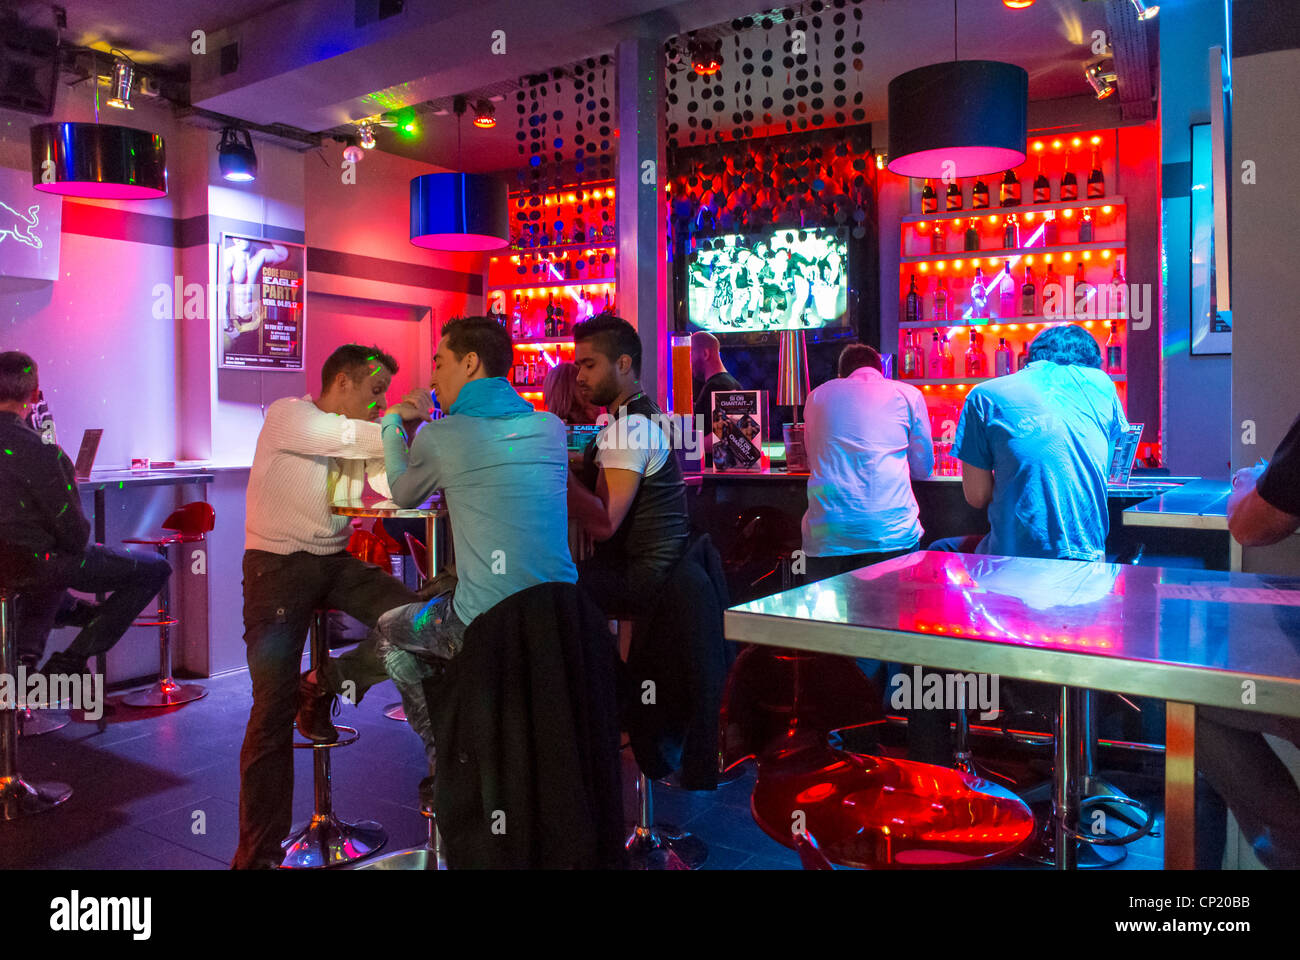 bar pub inside paris stock photos bar pub inside paris stock images alamy. Black Bedroom Furniture Sets. Home Design Ideas